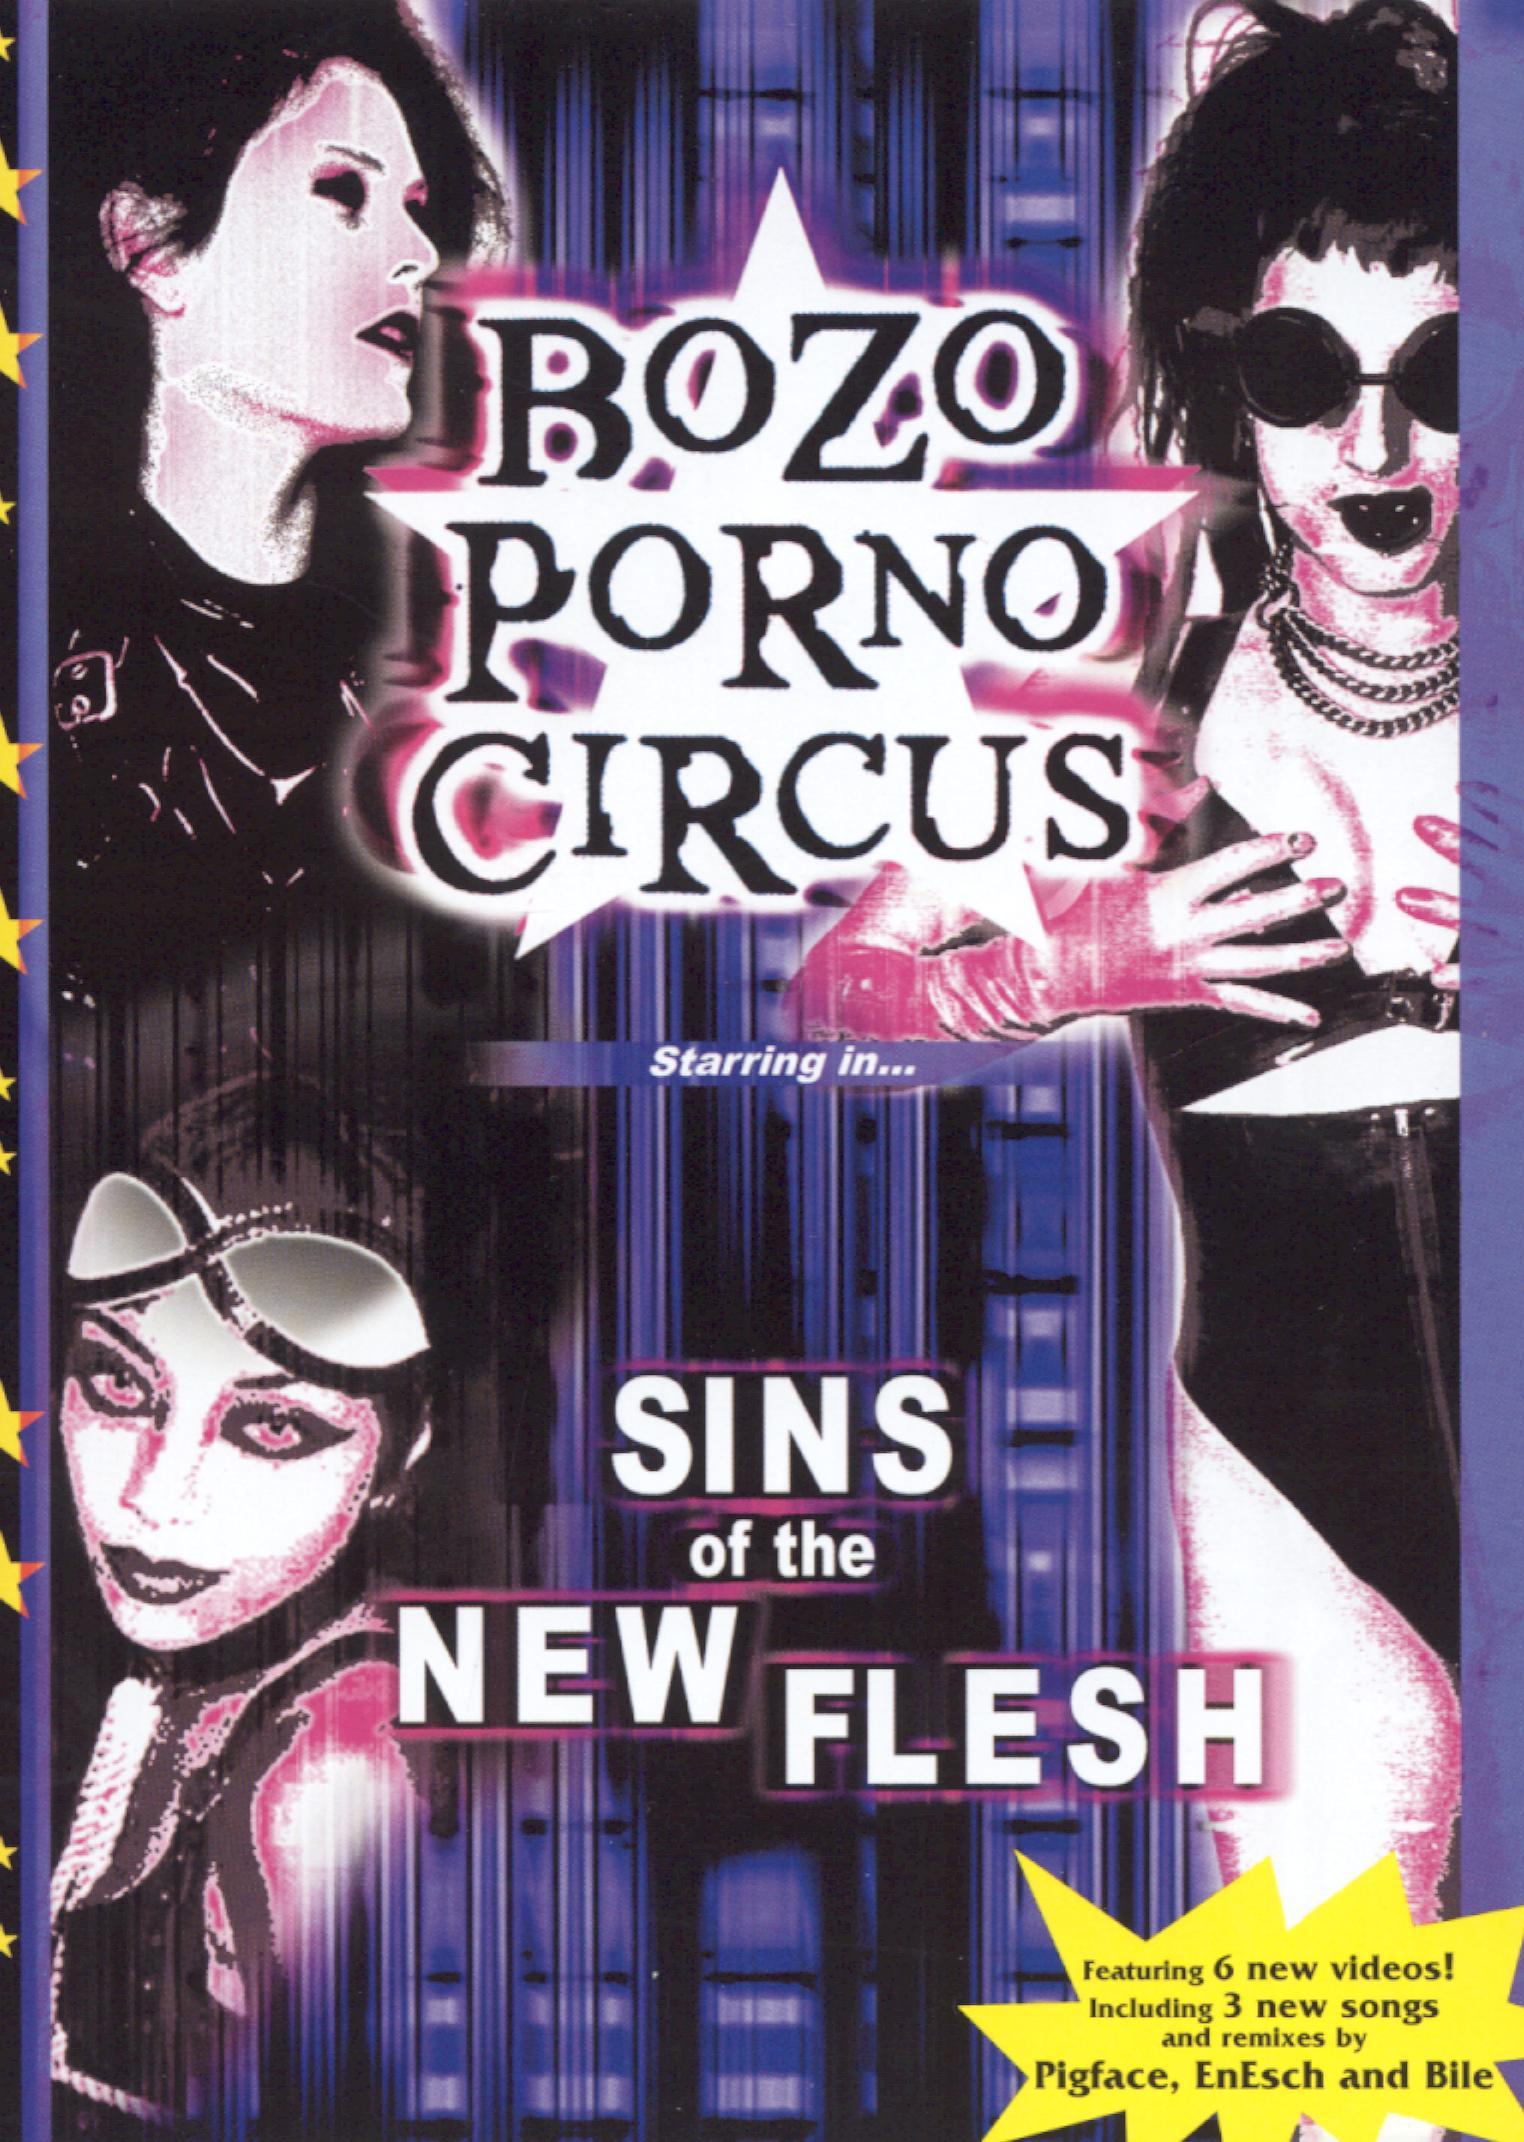 Bozo Porno Circus: Sins of the New Flesh